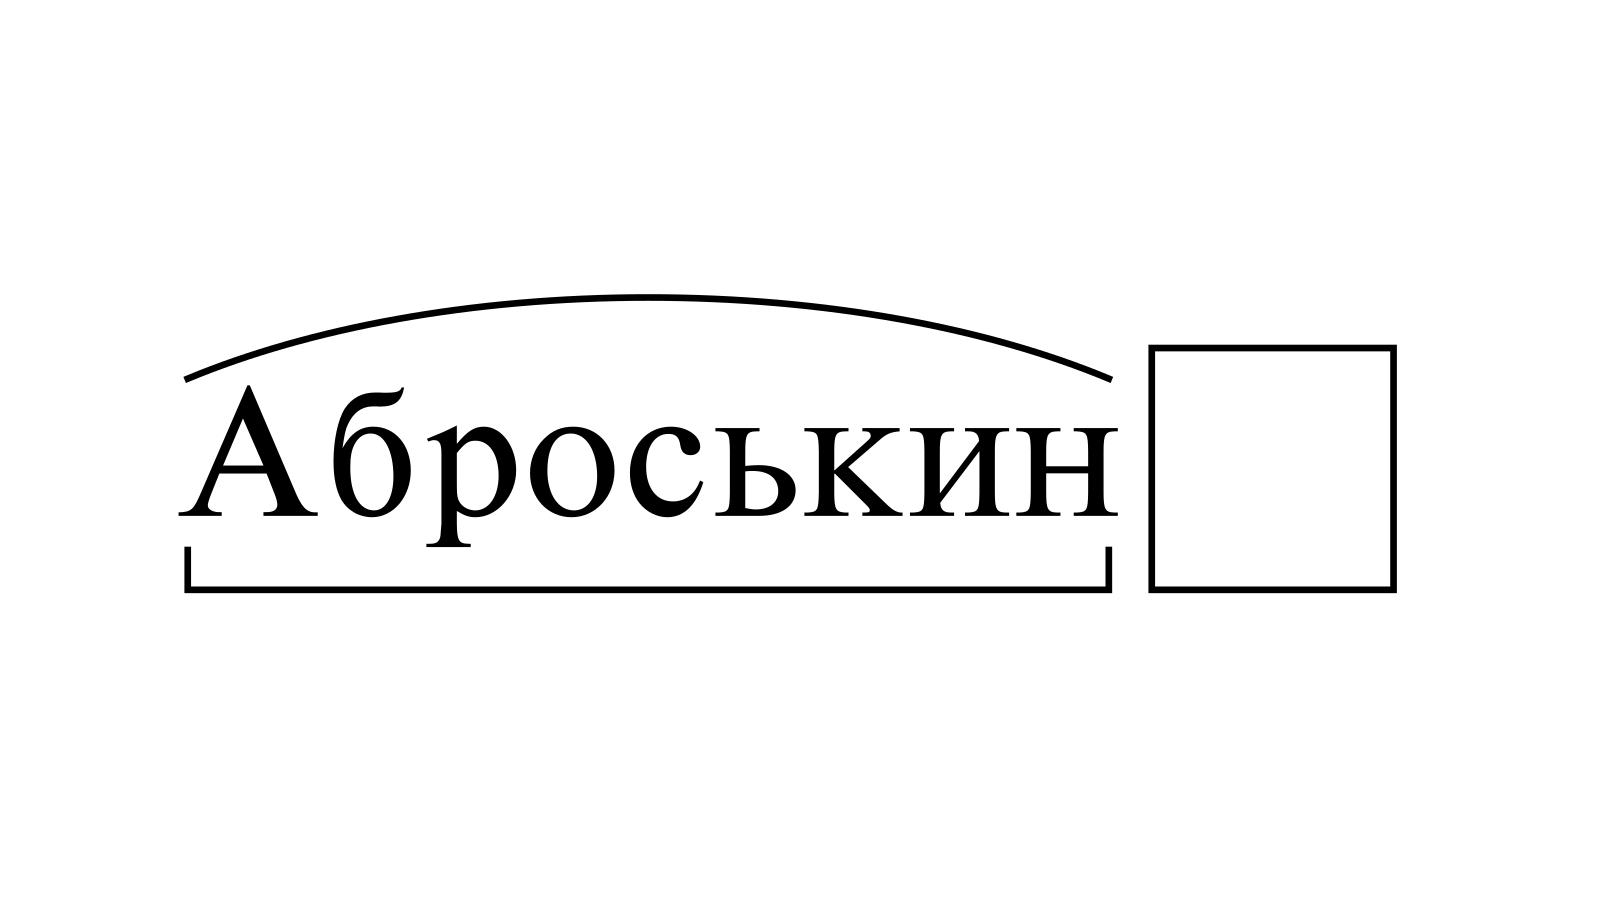 Разбор слова «Аброськин» по составу